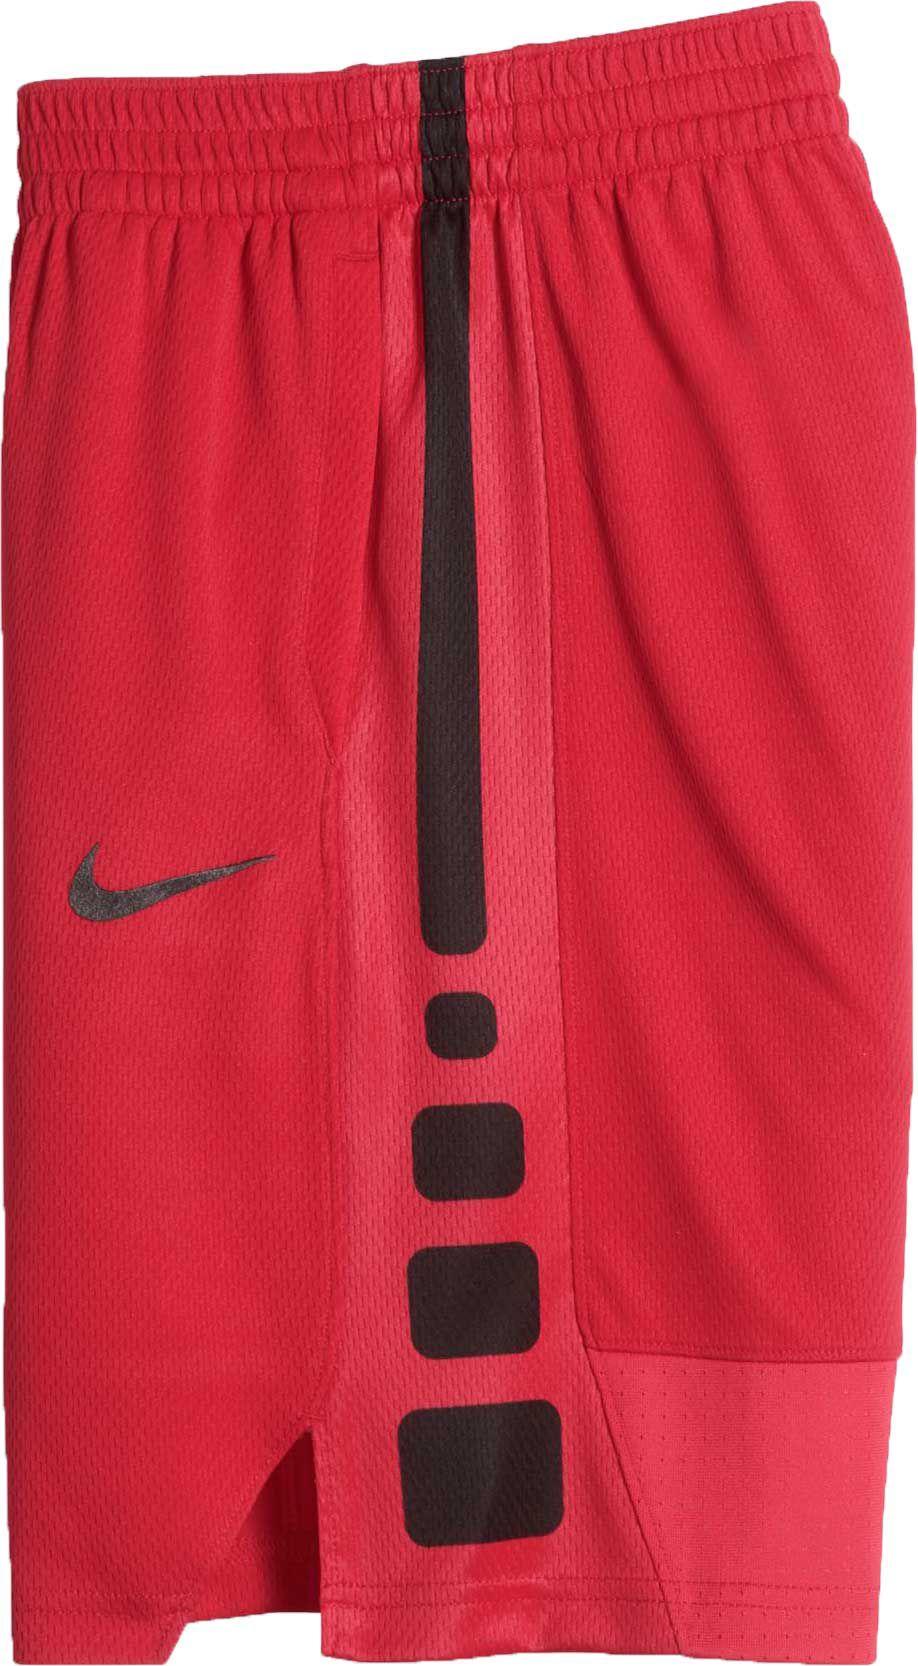 87c12abef9e5 Nike Boys  Dry Elite Stripe Basketball Shorts